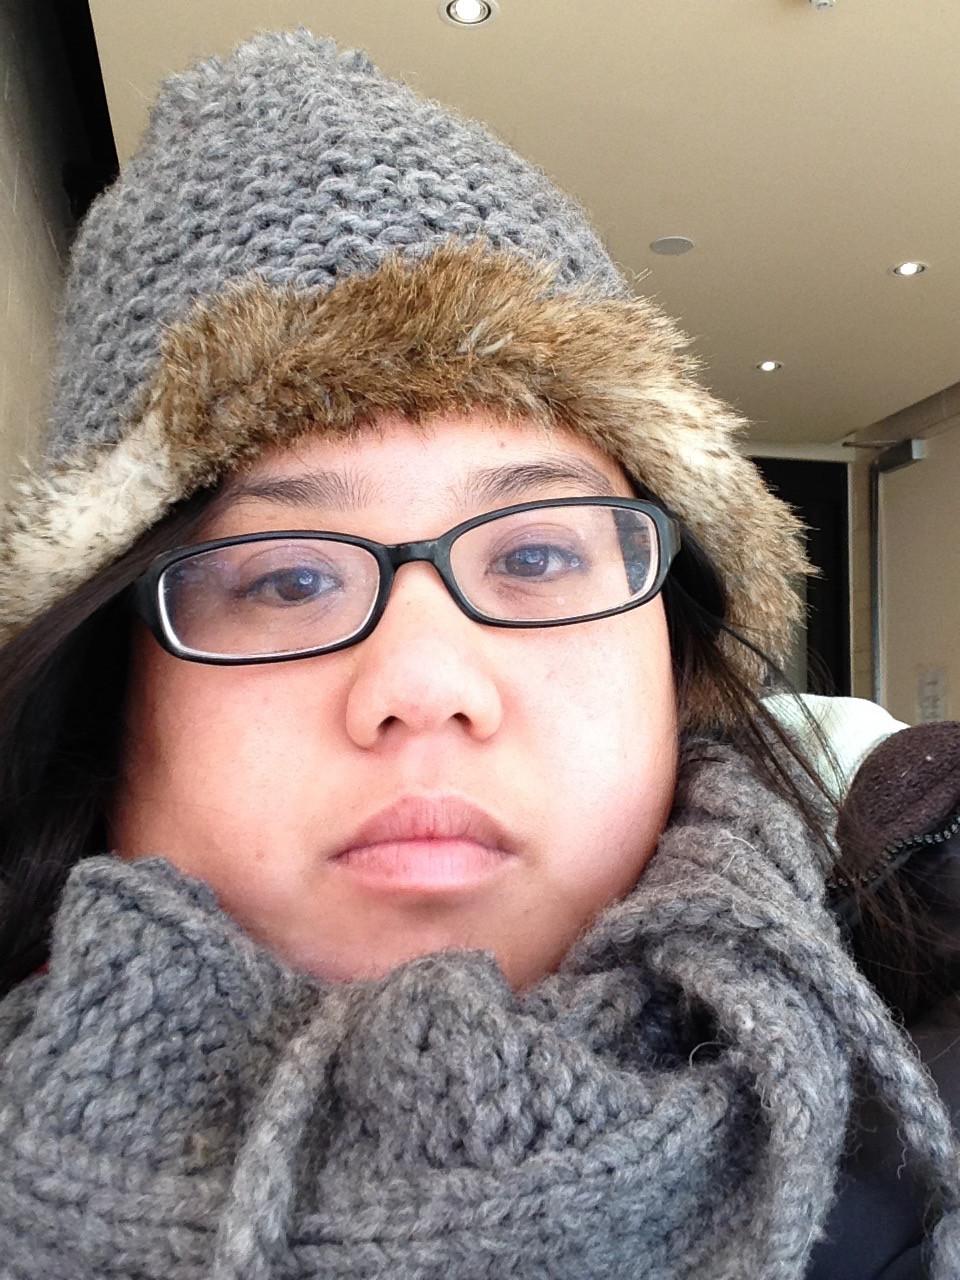 Ling selfie in winter 2014